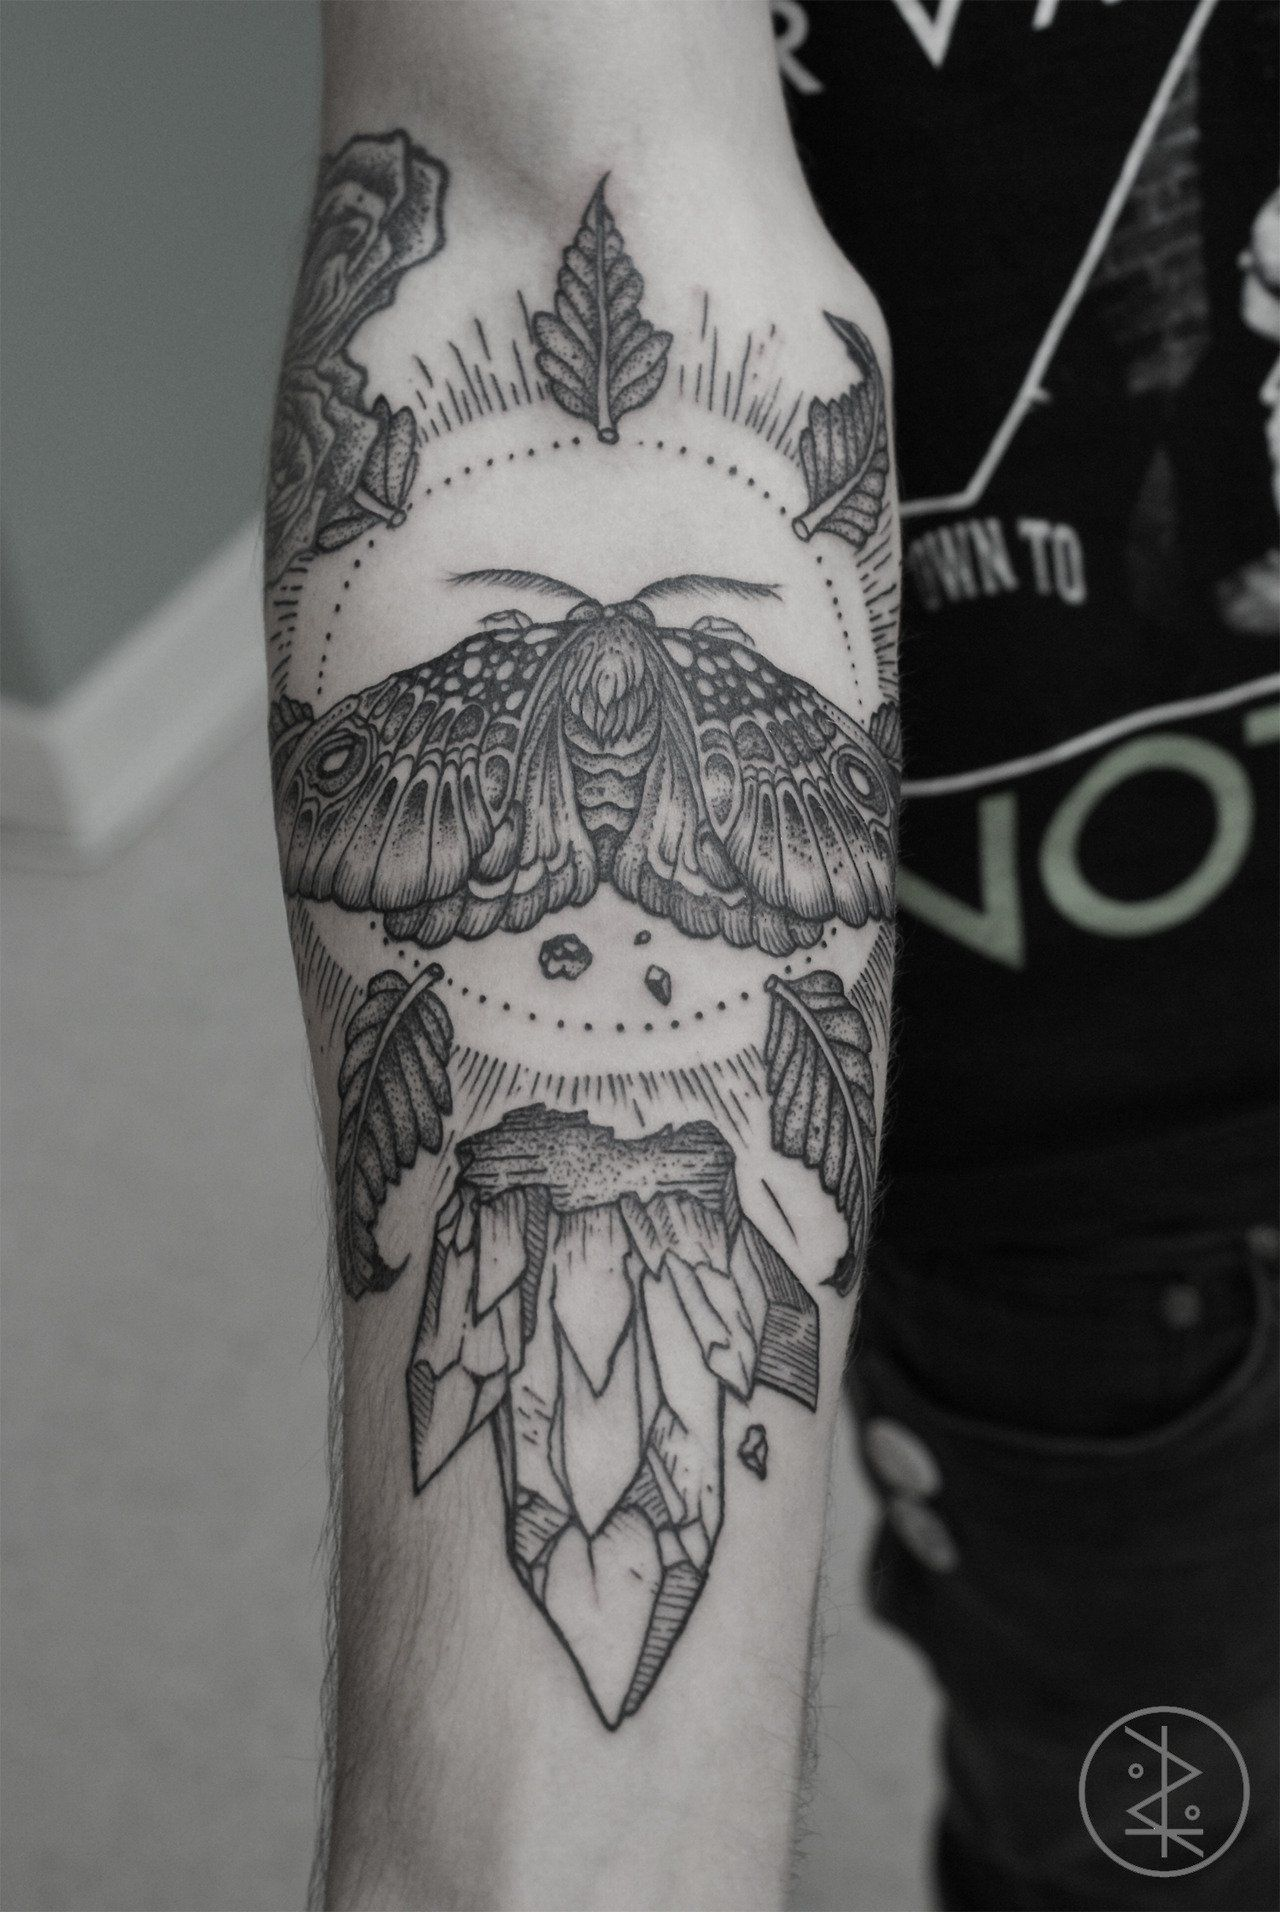 Great cover up tattoo ideas mandala forearm tattoo  google search  bodyartuc  pinterest